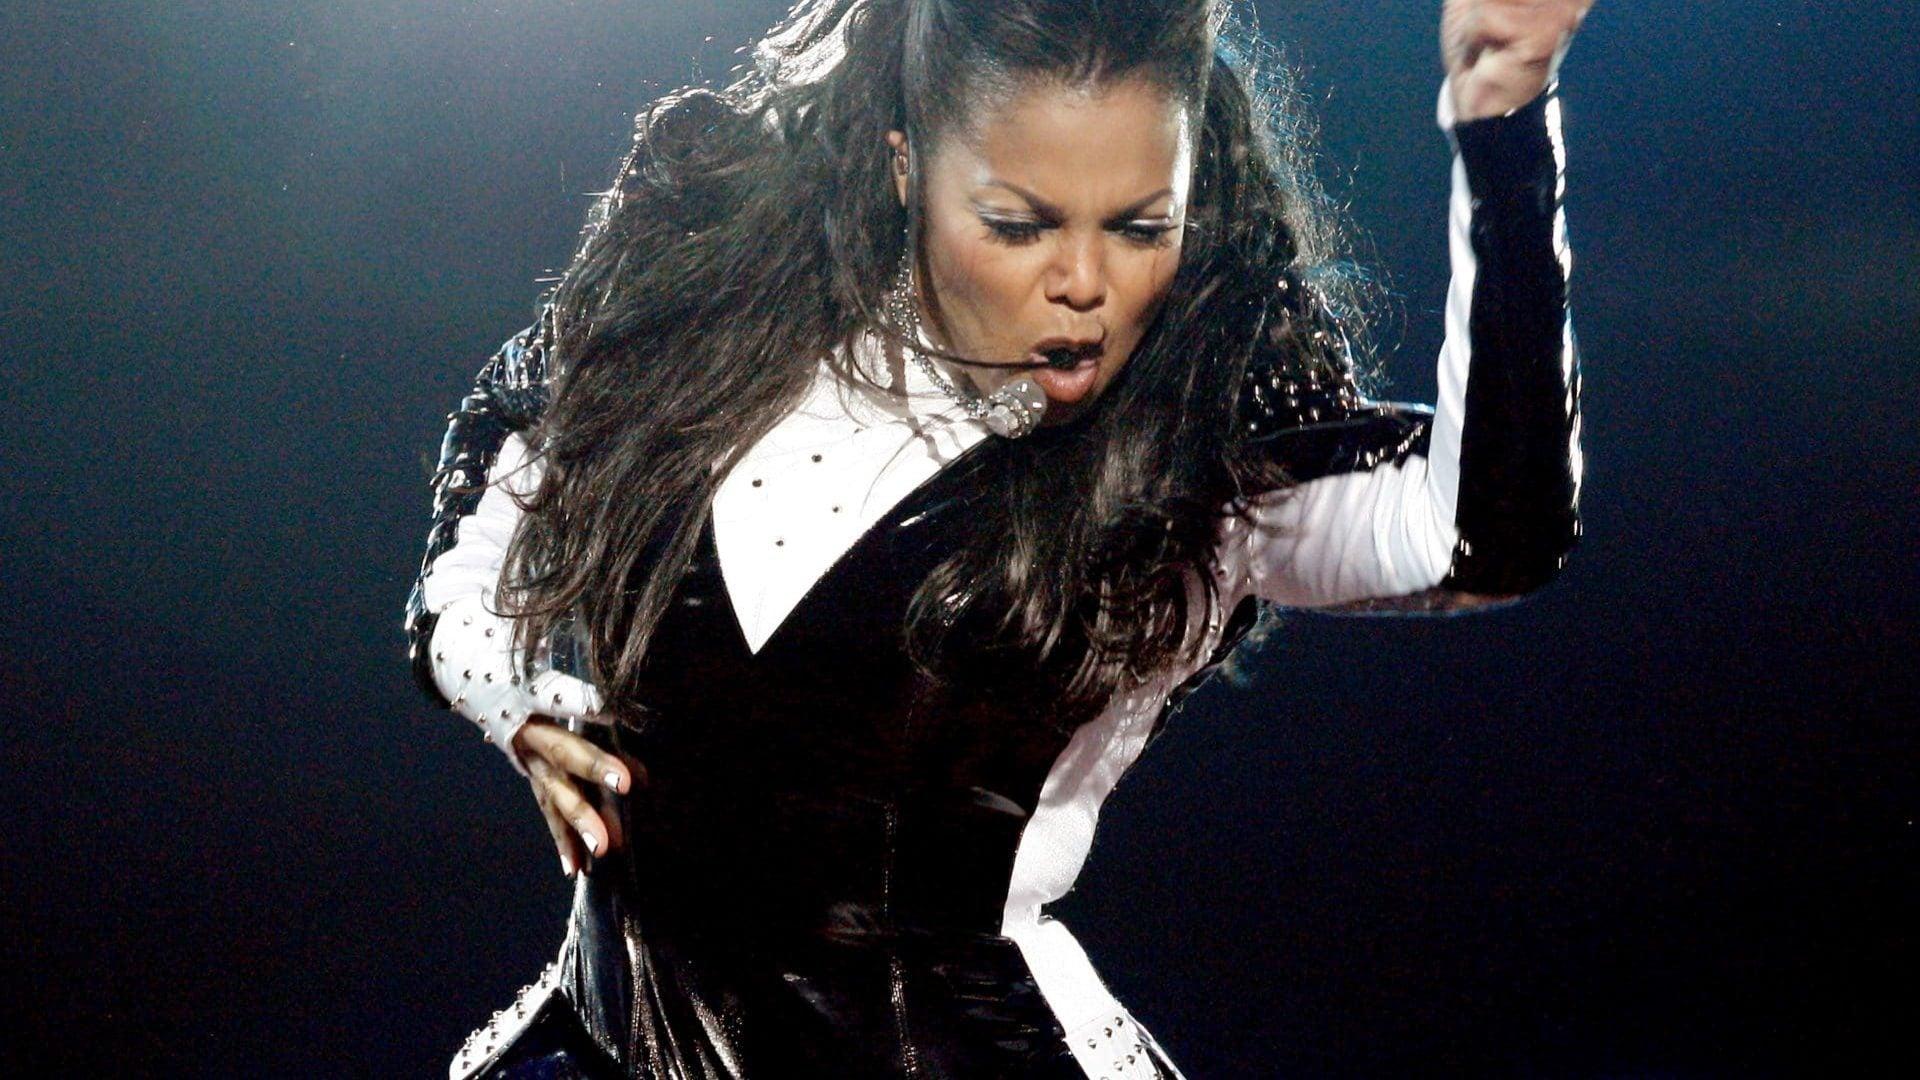 Viva Las Vegas! Janet Jackson Announces New Sin City Residency